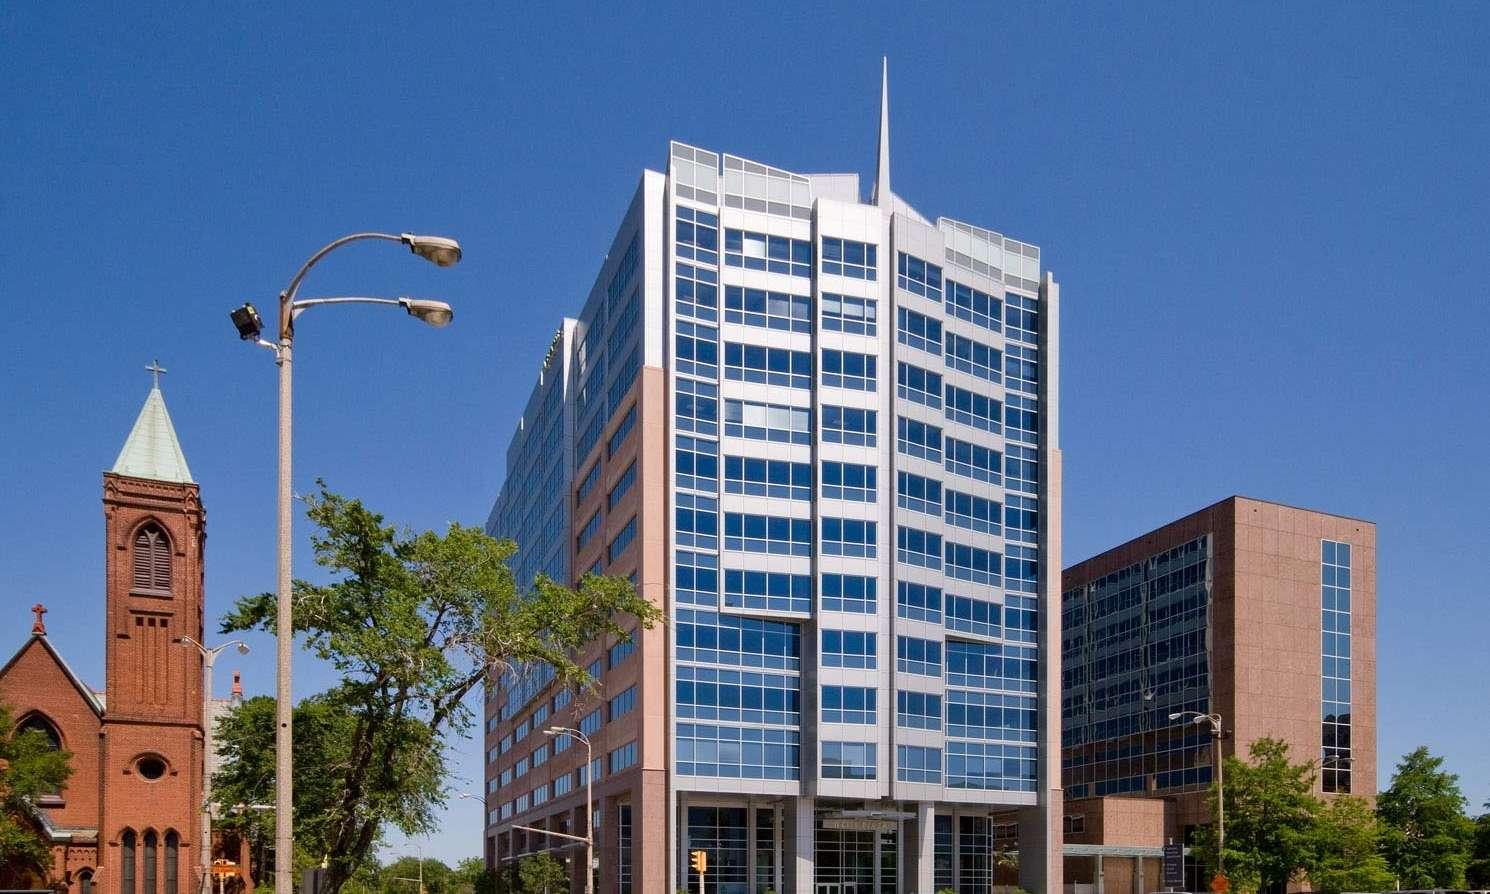 05-070 II-City-Plaza MG 7192